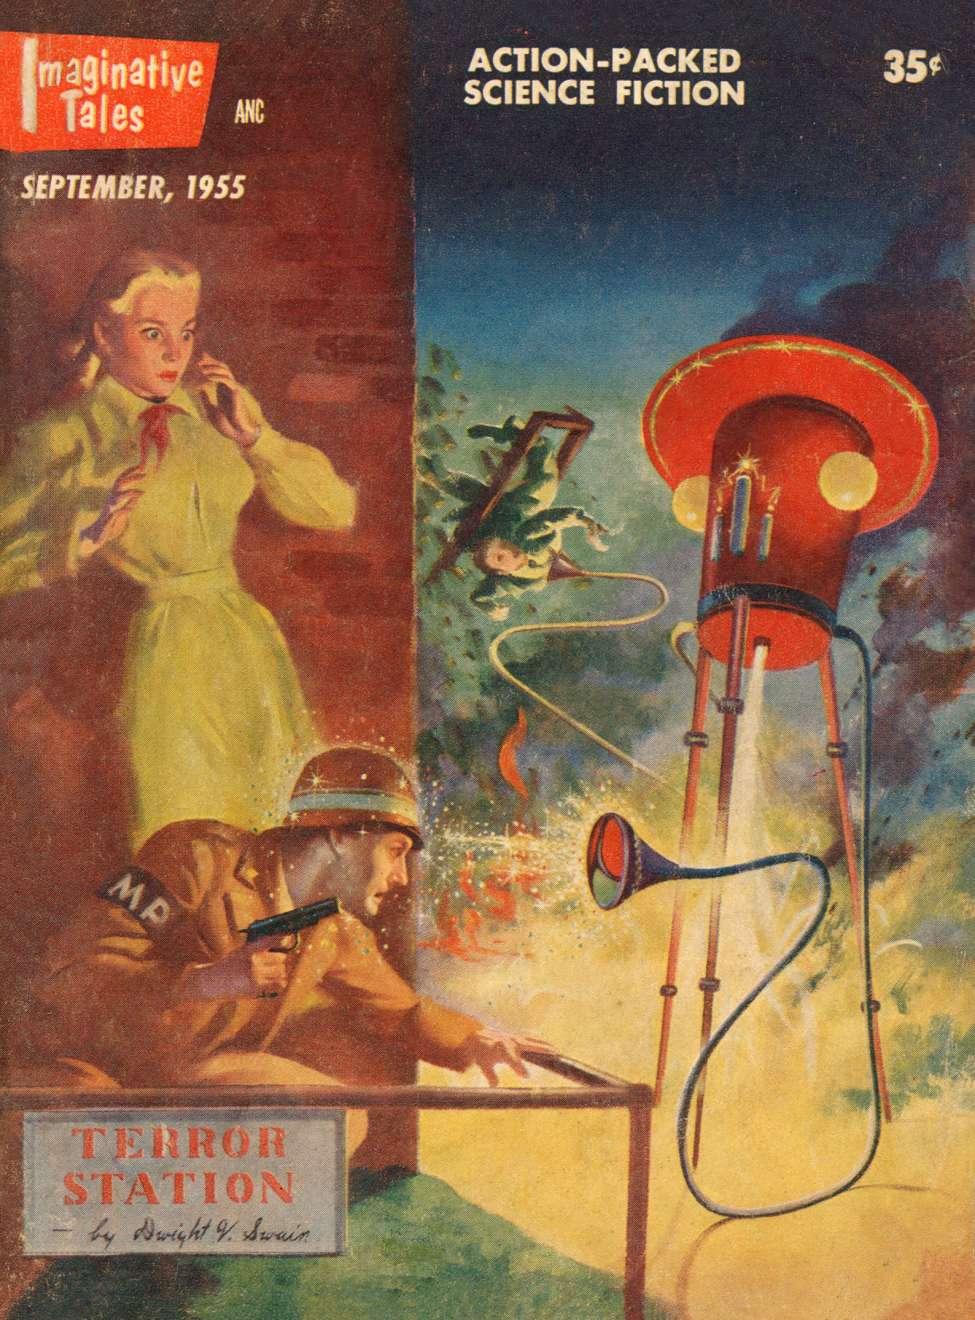 Comic Book Cover For Imaginative Tales v02 01 - Terror Station - Dwight V. Swain